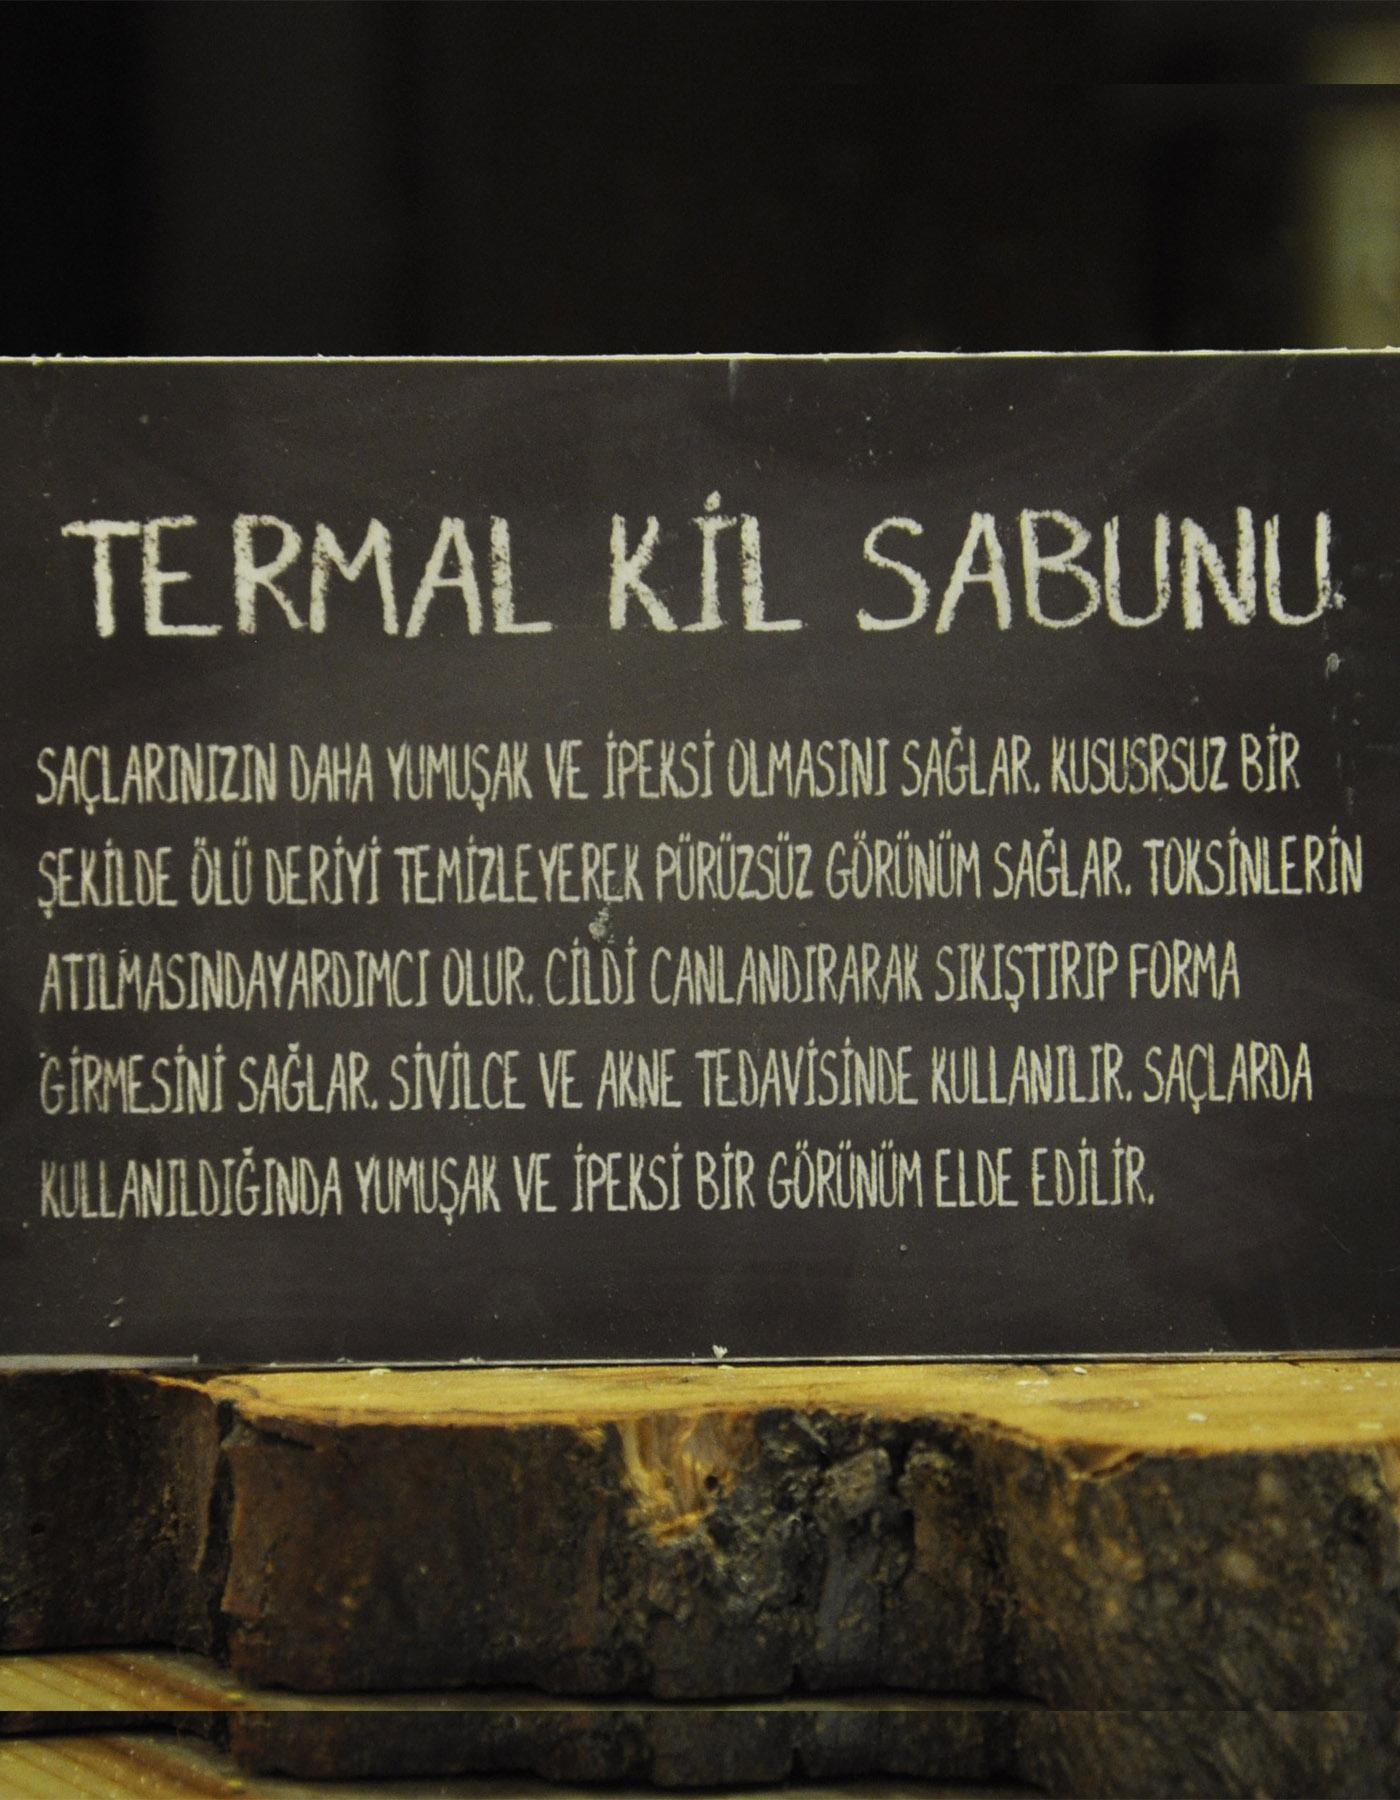 El Yapımı Doğal Termal Kil Sabunu 110 Gr. - Thumbnail